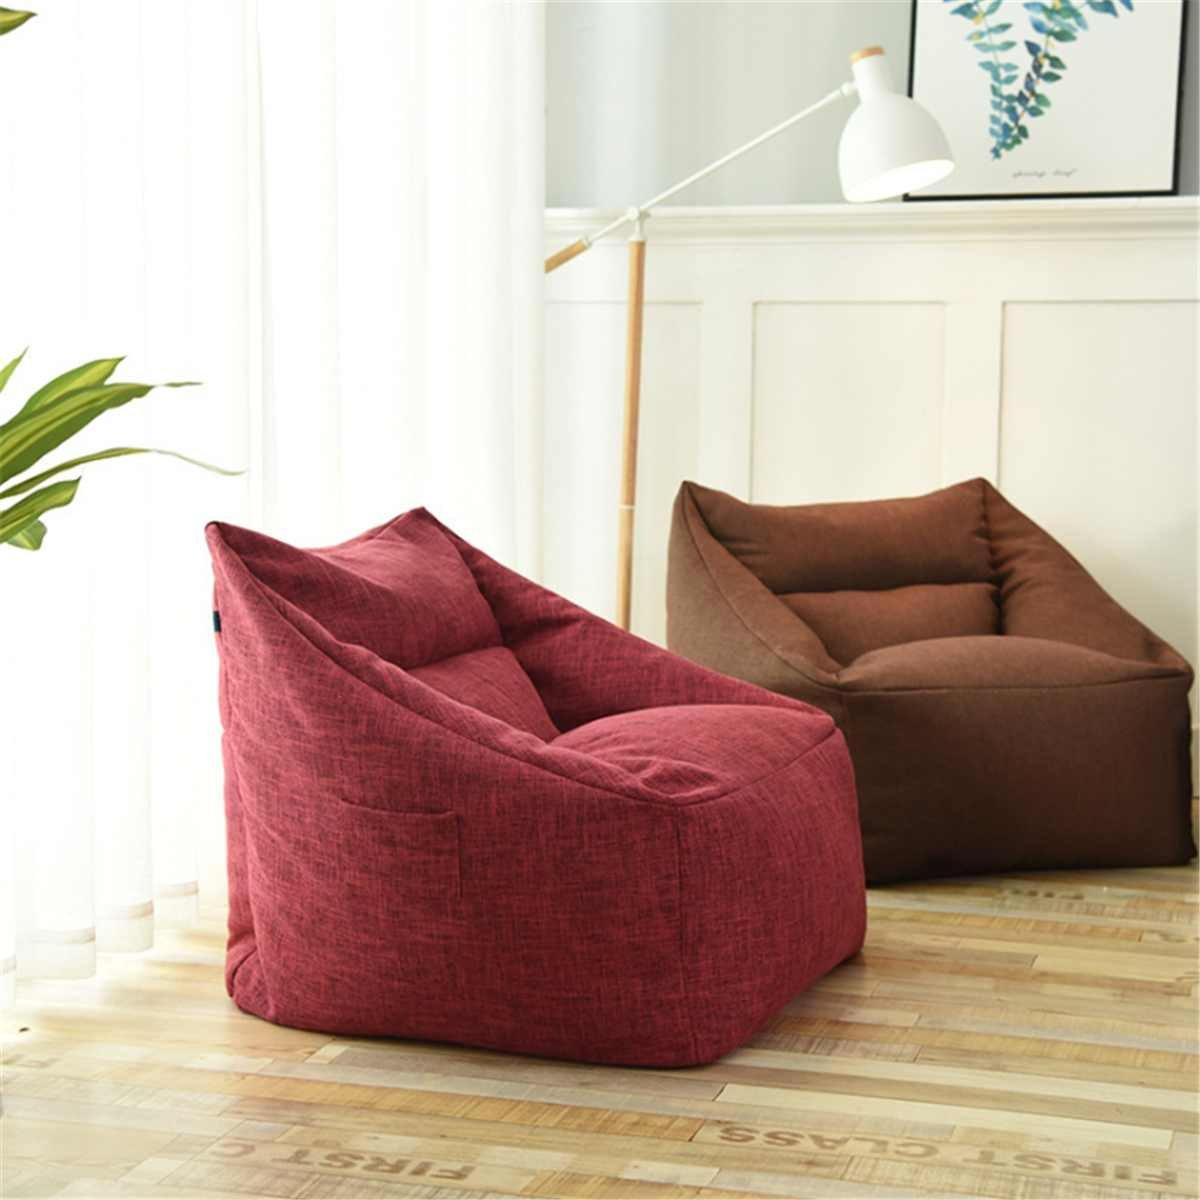 Louis Fashion Bean Bag Sofas Lazy Tatami Single Folding Window Computer Sofa Chair